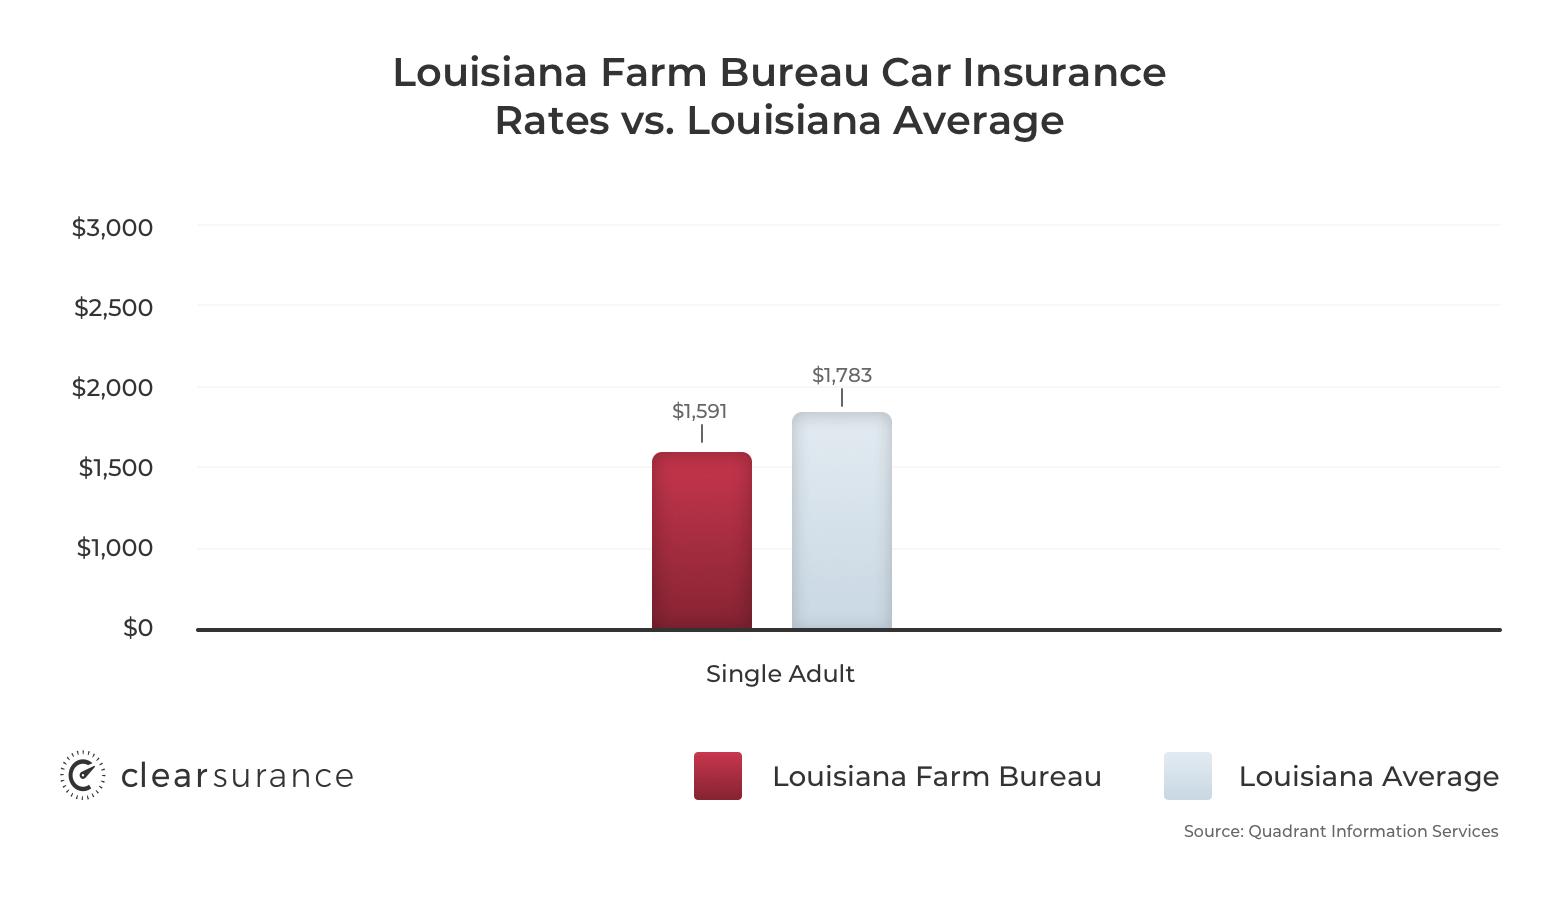 Louisiana Farm Bureau car insurance rates